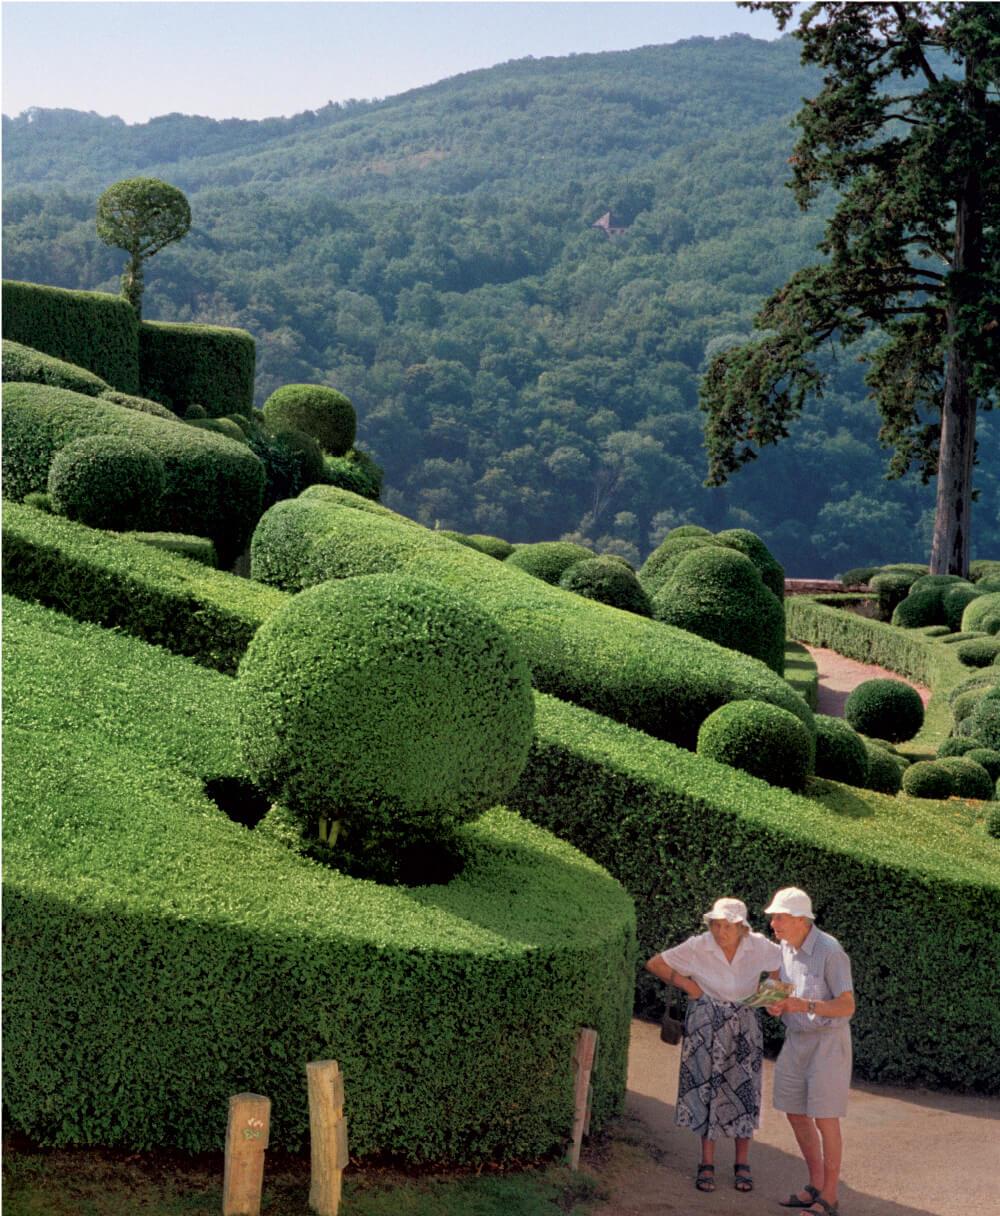 marqueyssac-topiary-gardens-philippe-jarrigeon-6